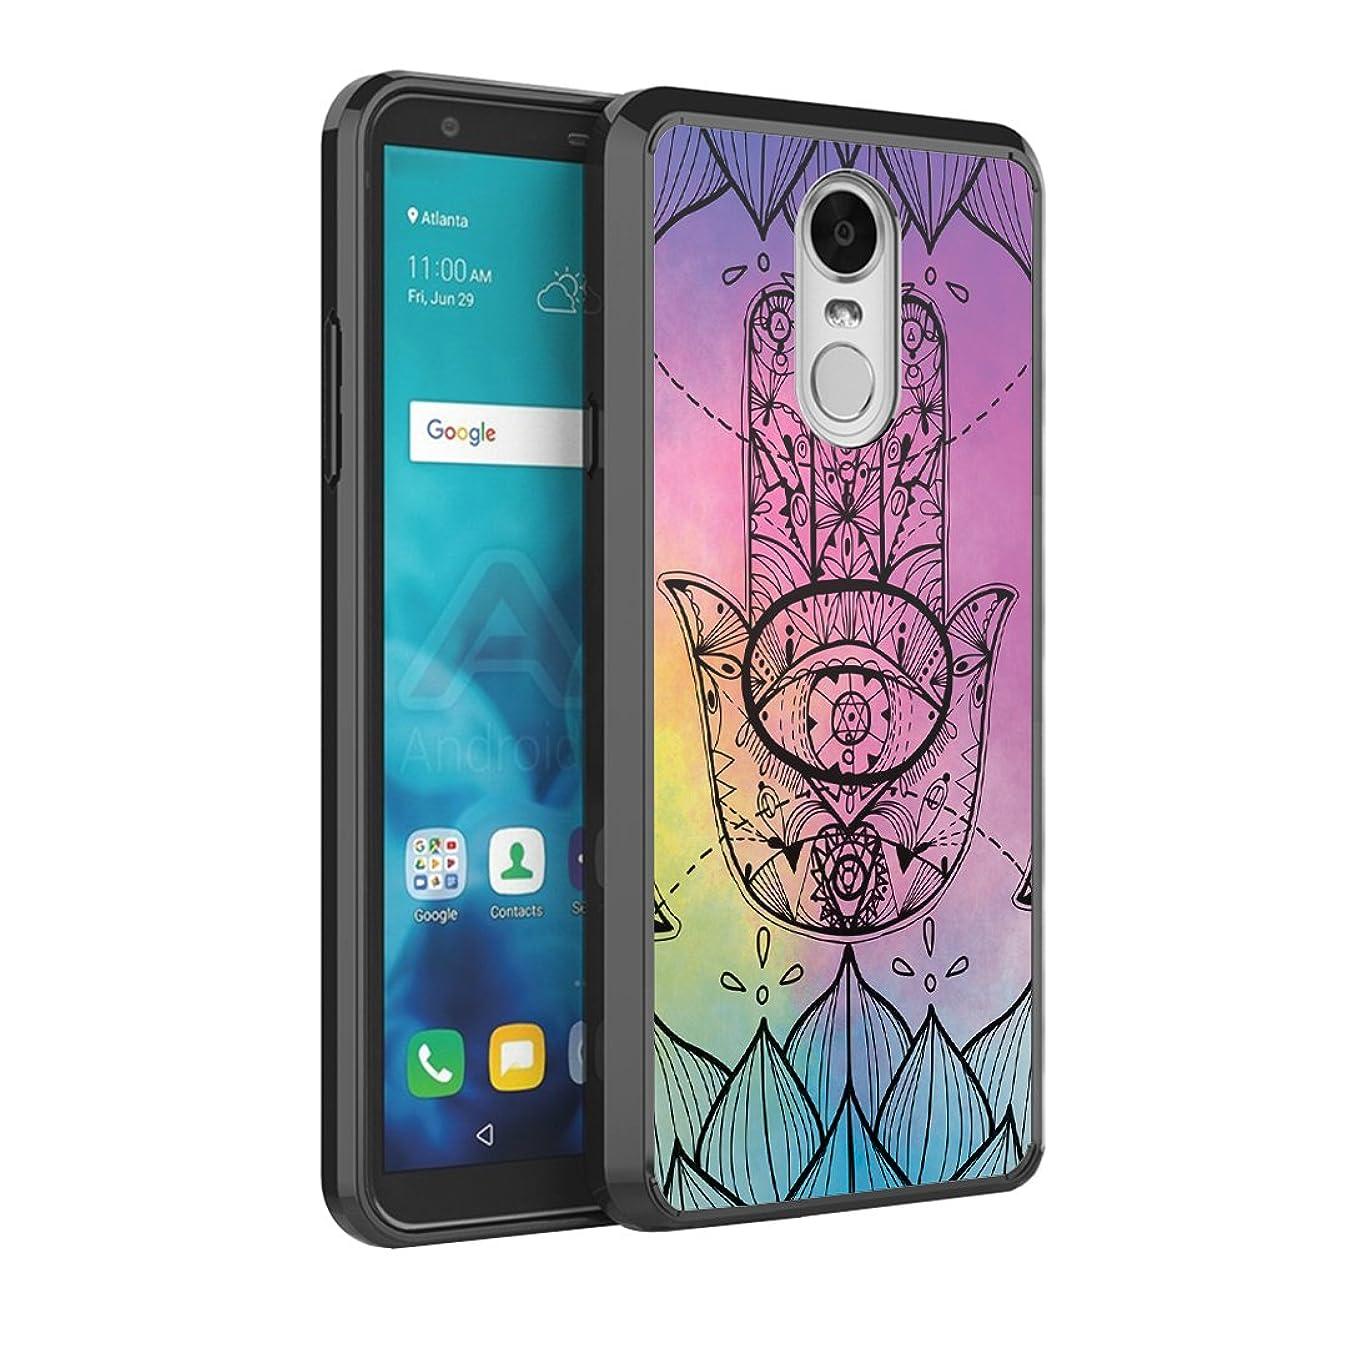 Capsule Case Compatible with LG Stylo 4 Plus, LG Stylo 4, LG Q Stylus [Slim Armor Scratch Resistant Slim Anti-Slip Protective Phone Cover Black Case] for LG Stylo 4 - (Lotus Hamsa) c9741305193